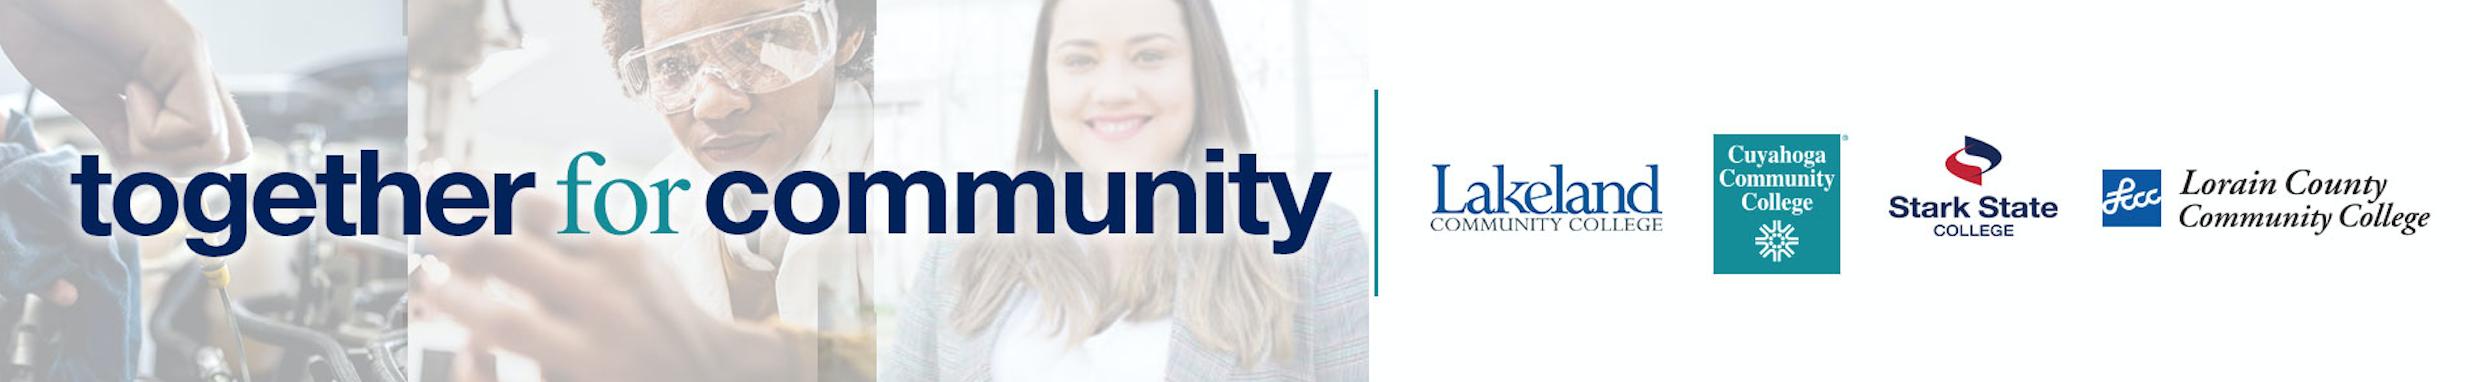 together for community